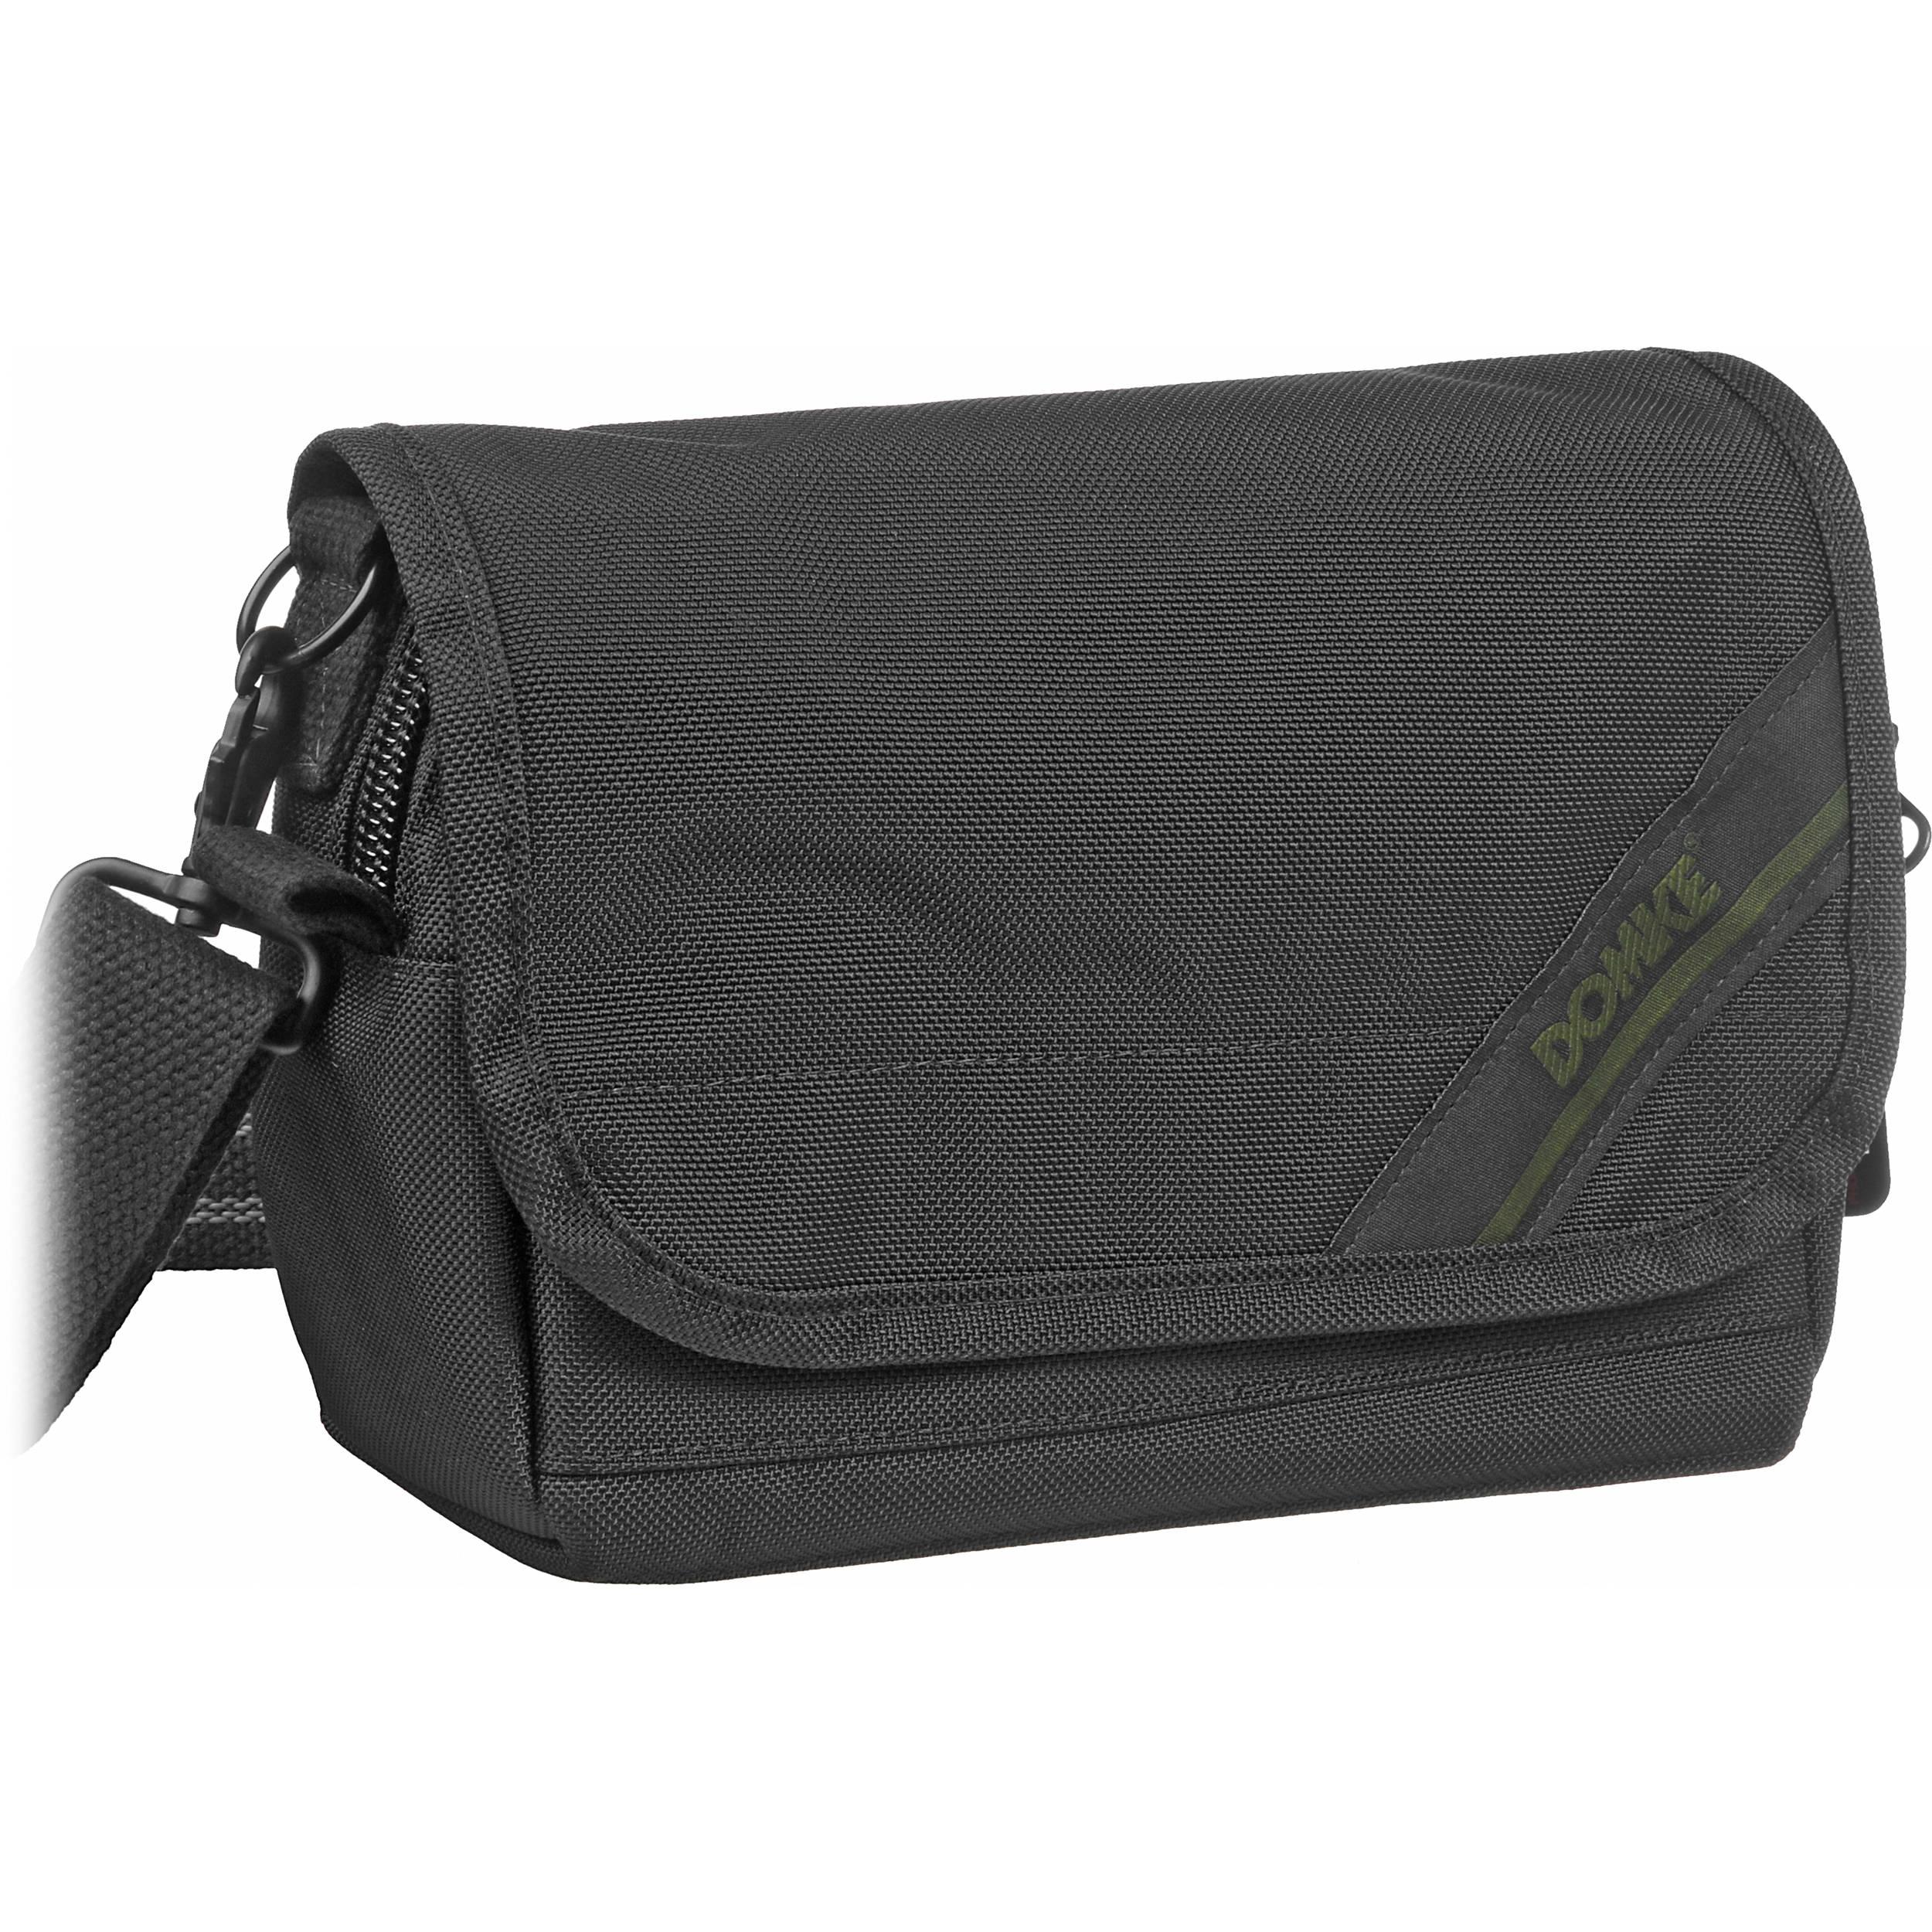 Domke J-5XB Shoulder and Belt Bag, Medium 700-J5B B H Photo c596fbf783